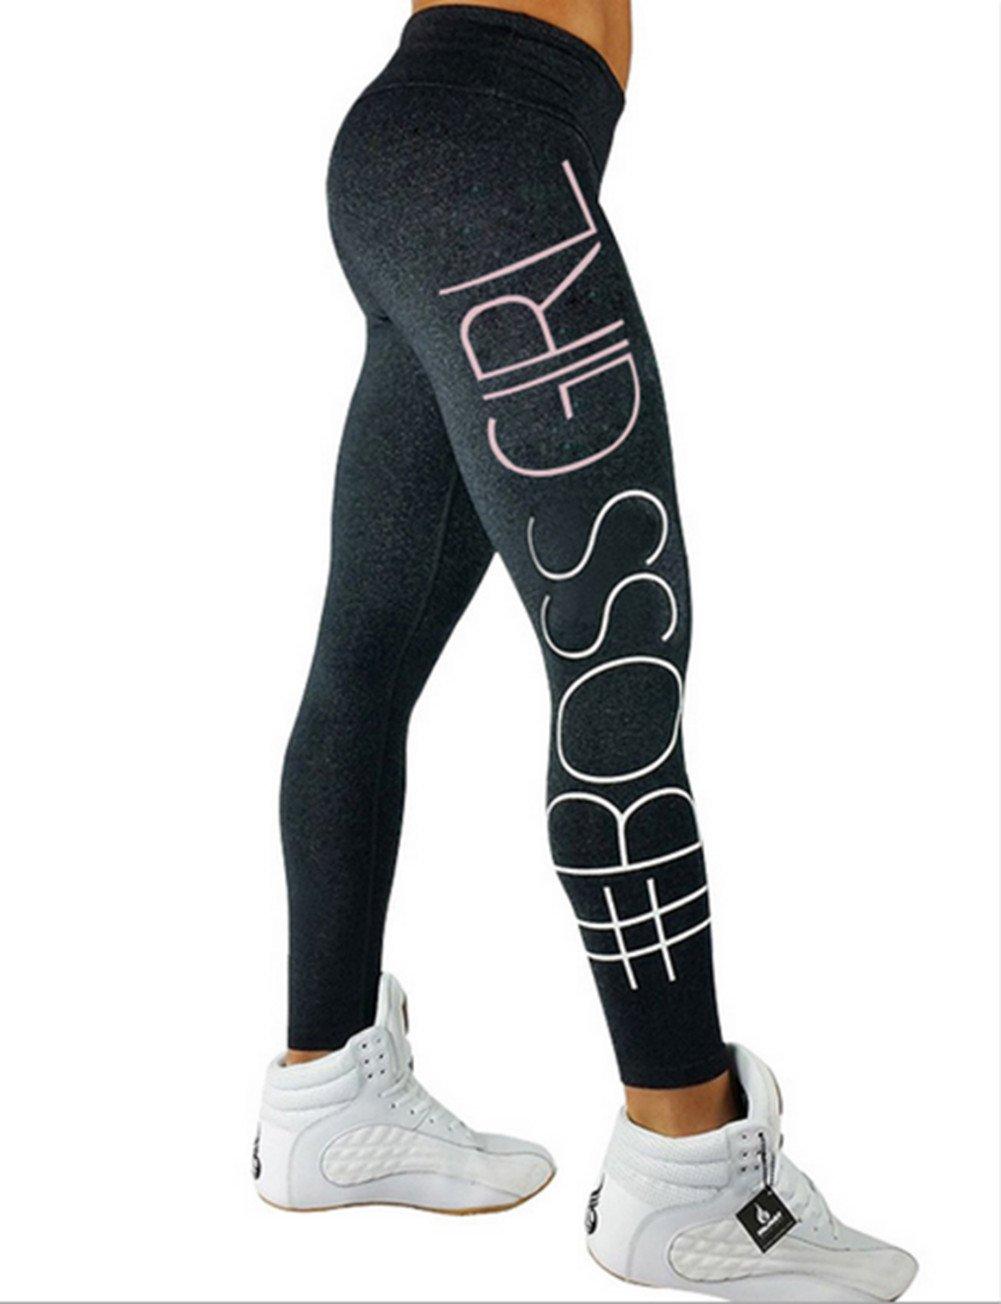 SRYSHKR 2018 Pants Yoga Leggings High Workout Waist Fitness Women's Running Premium Thick Slimming Sportwear Hot Sale Sport Trousers Riding Training Tight (Dark Gray, M)